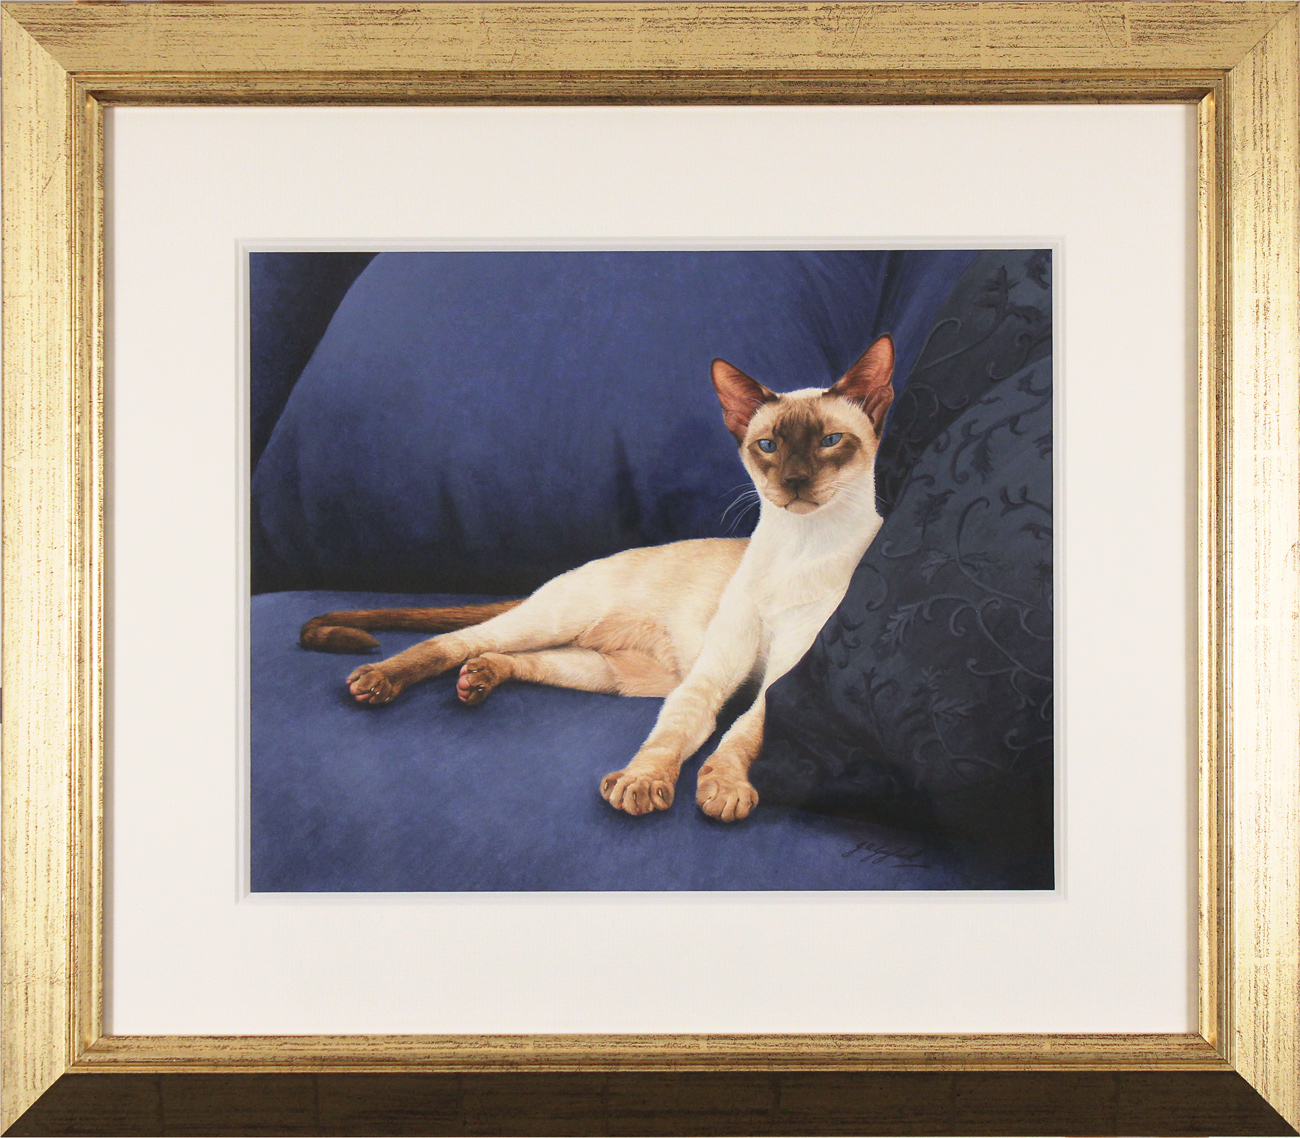 Jacqueline Gaylard, SOFA, Original acrylic painting on board, Sapphire, click to enlarge